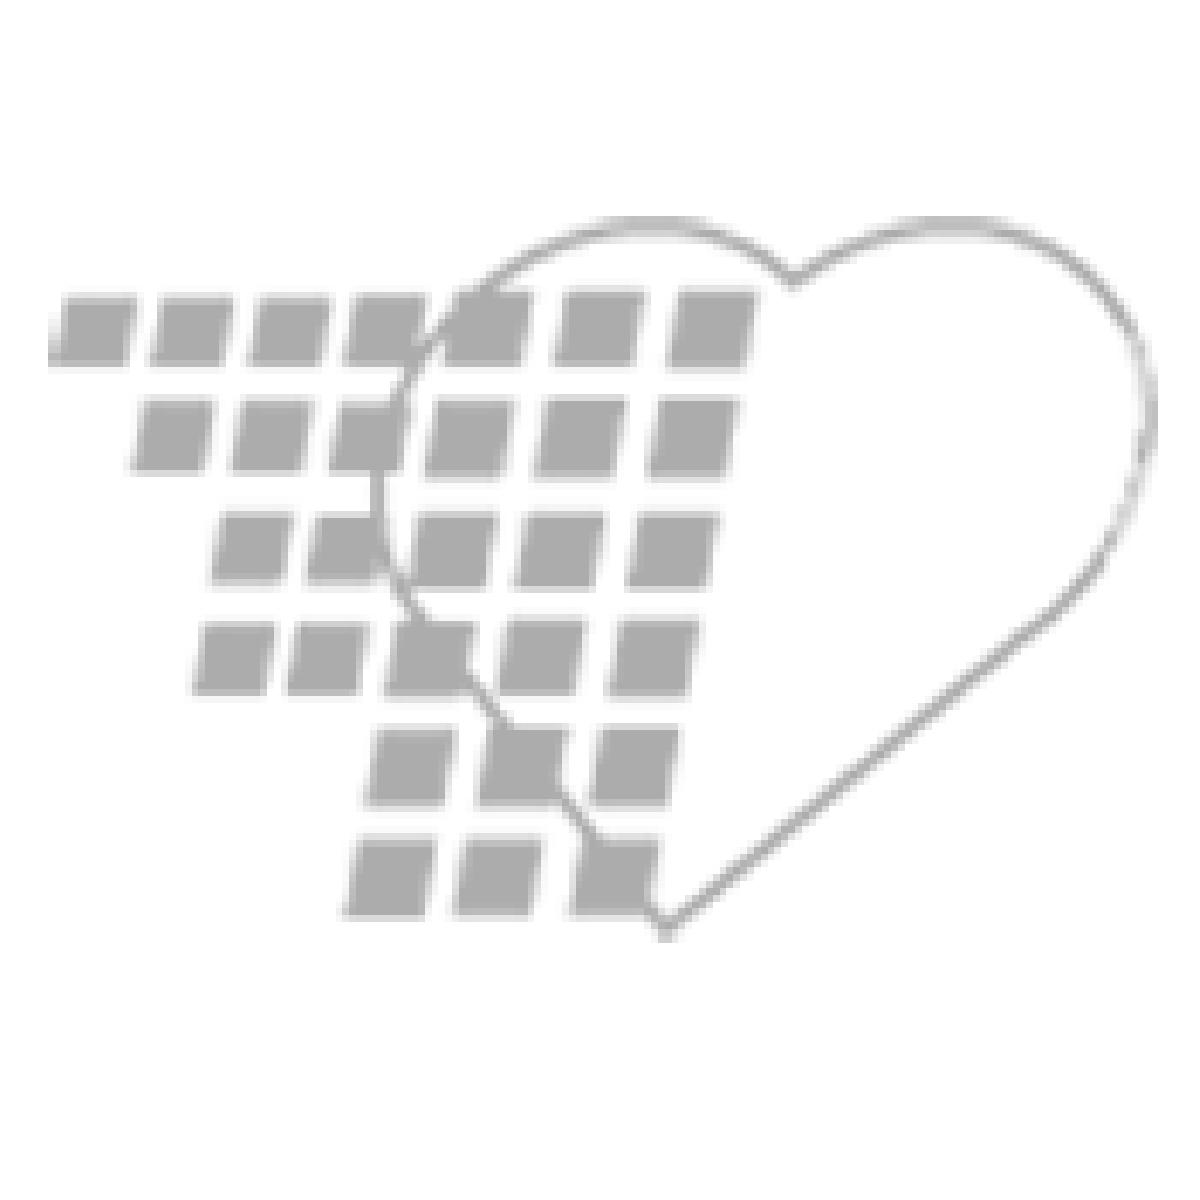 "06-82-2115 Magellan™ 12 mL Syringe with Hypodermic Safety Needle - 21 G x 1-1/2"""